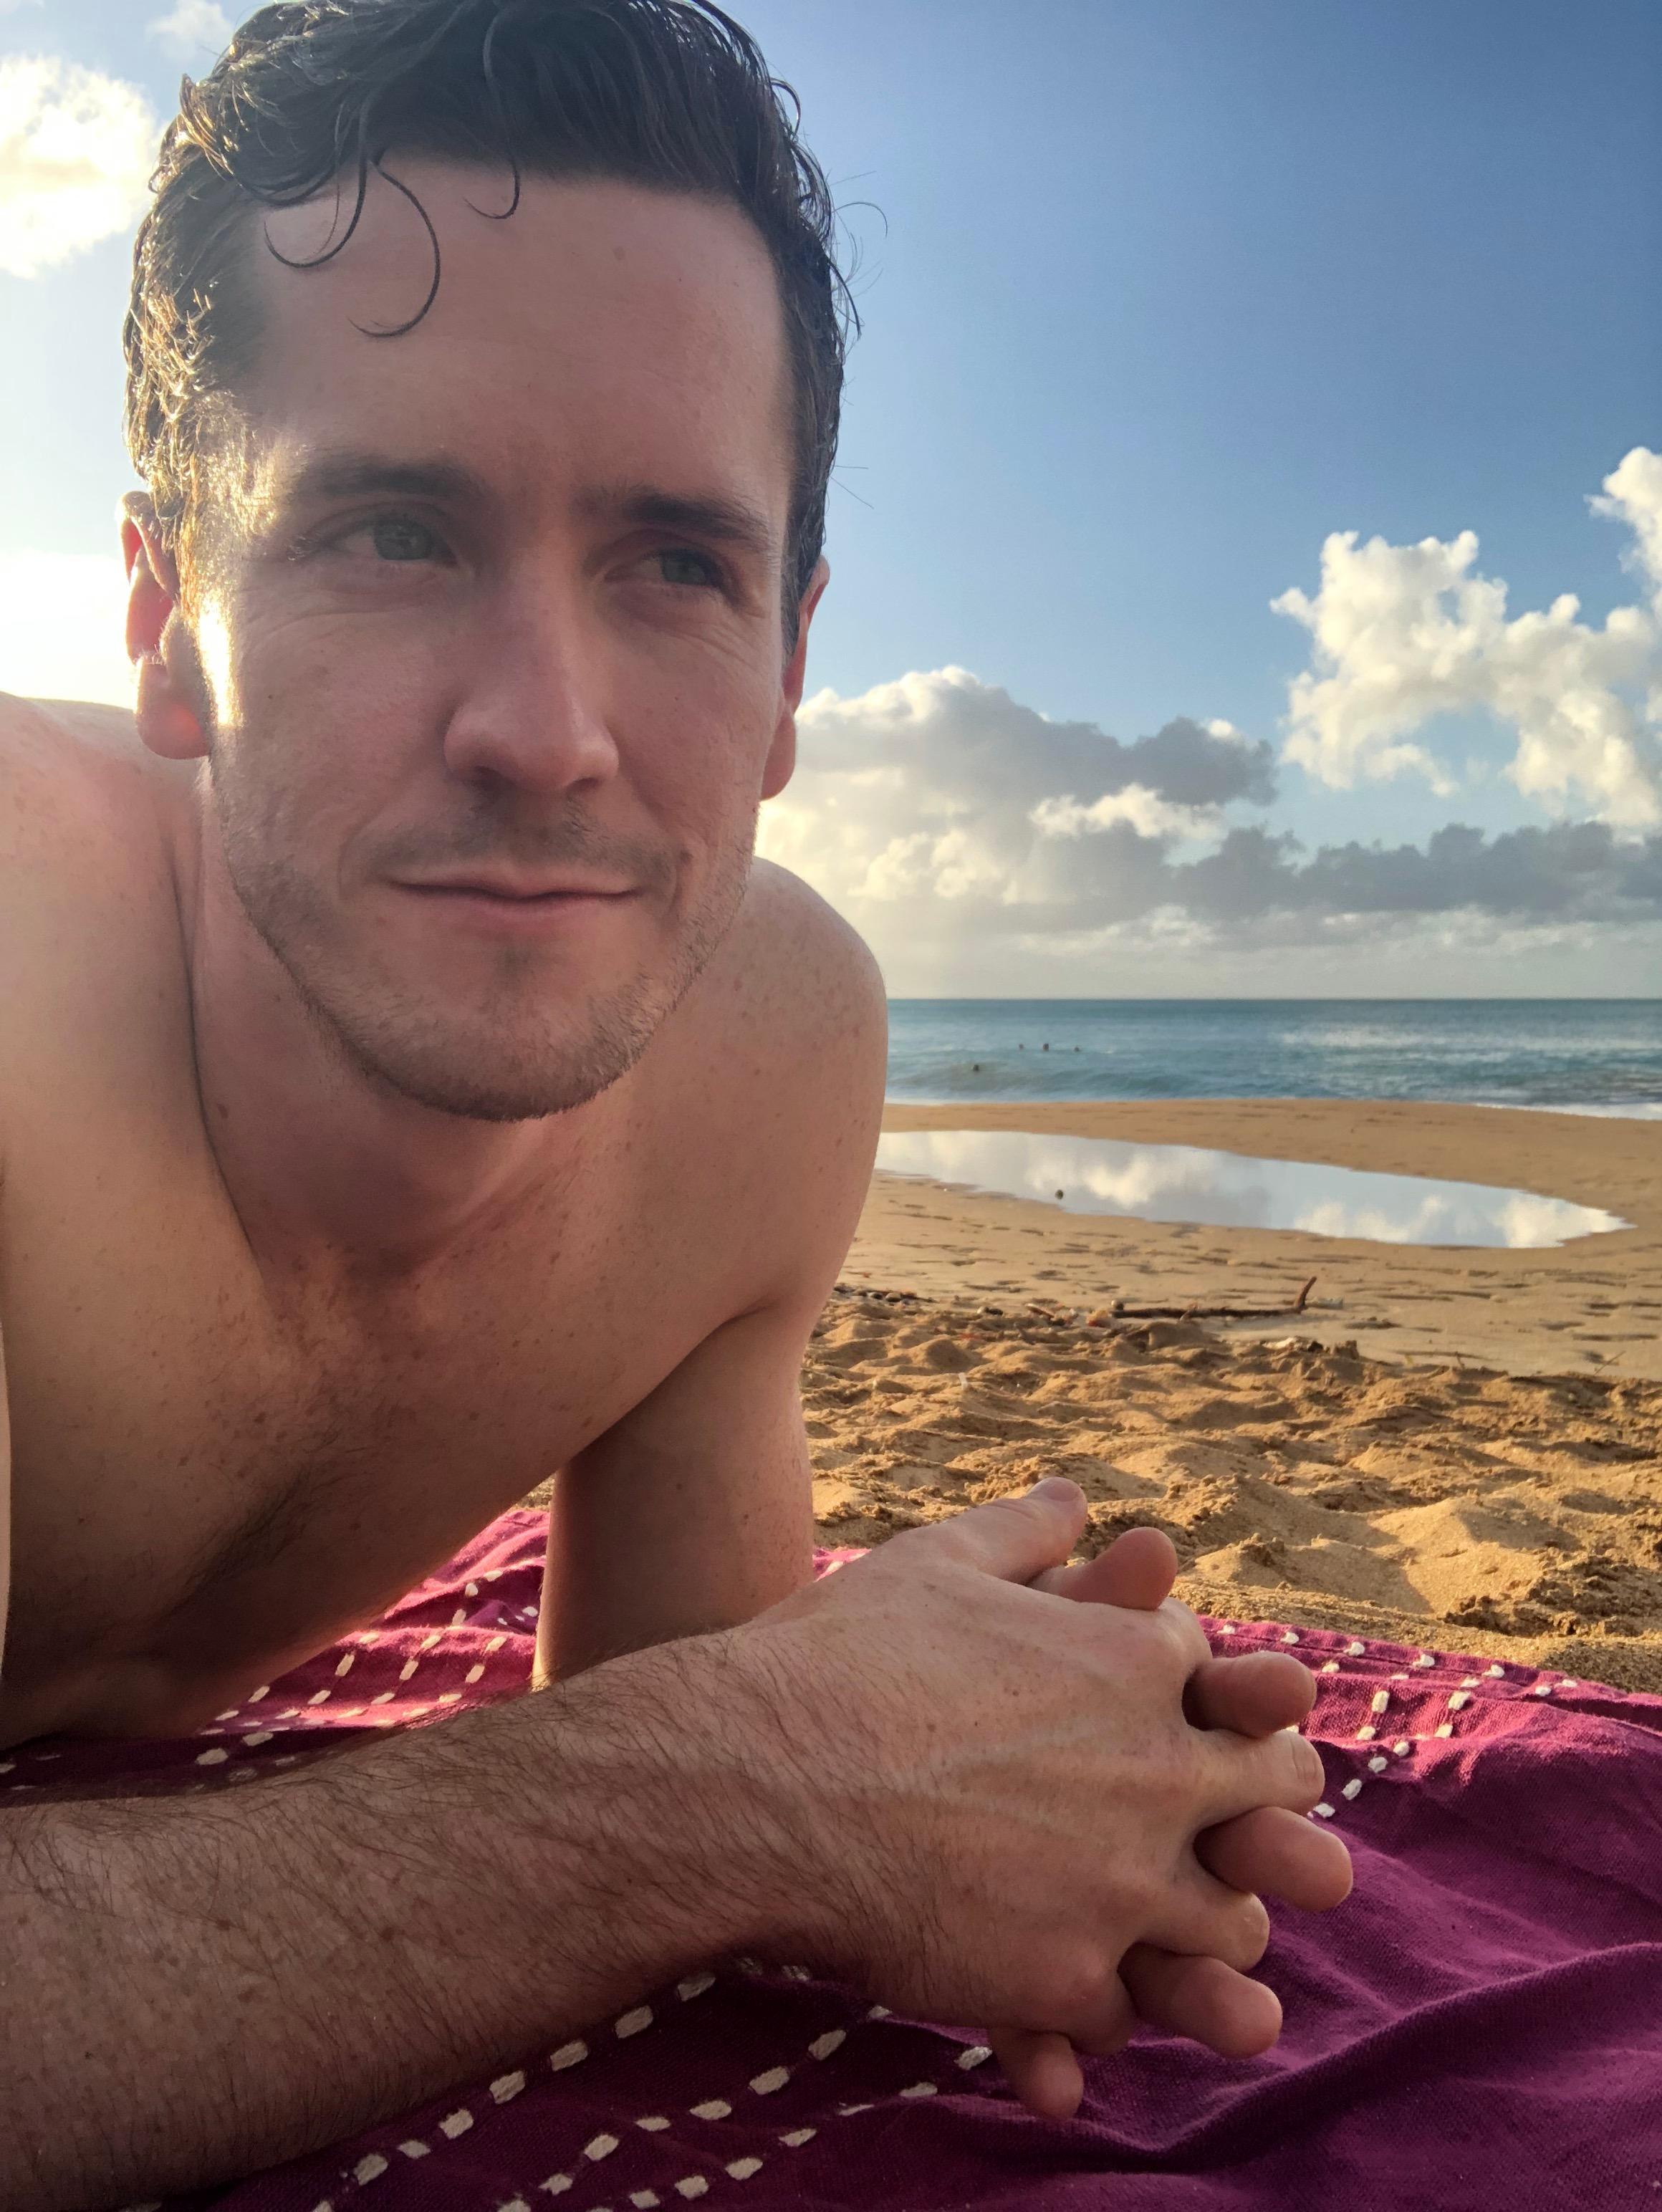 Plage de la Perle Guadeloupe Beach Sand Ocean Caribbean